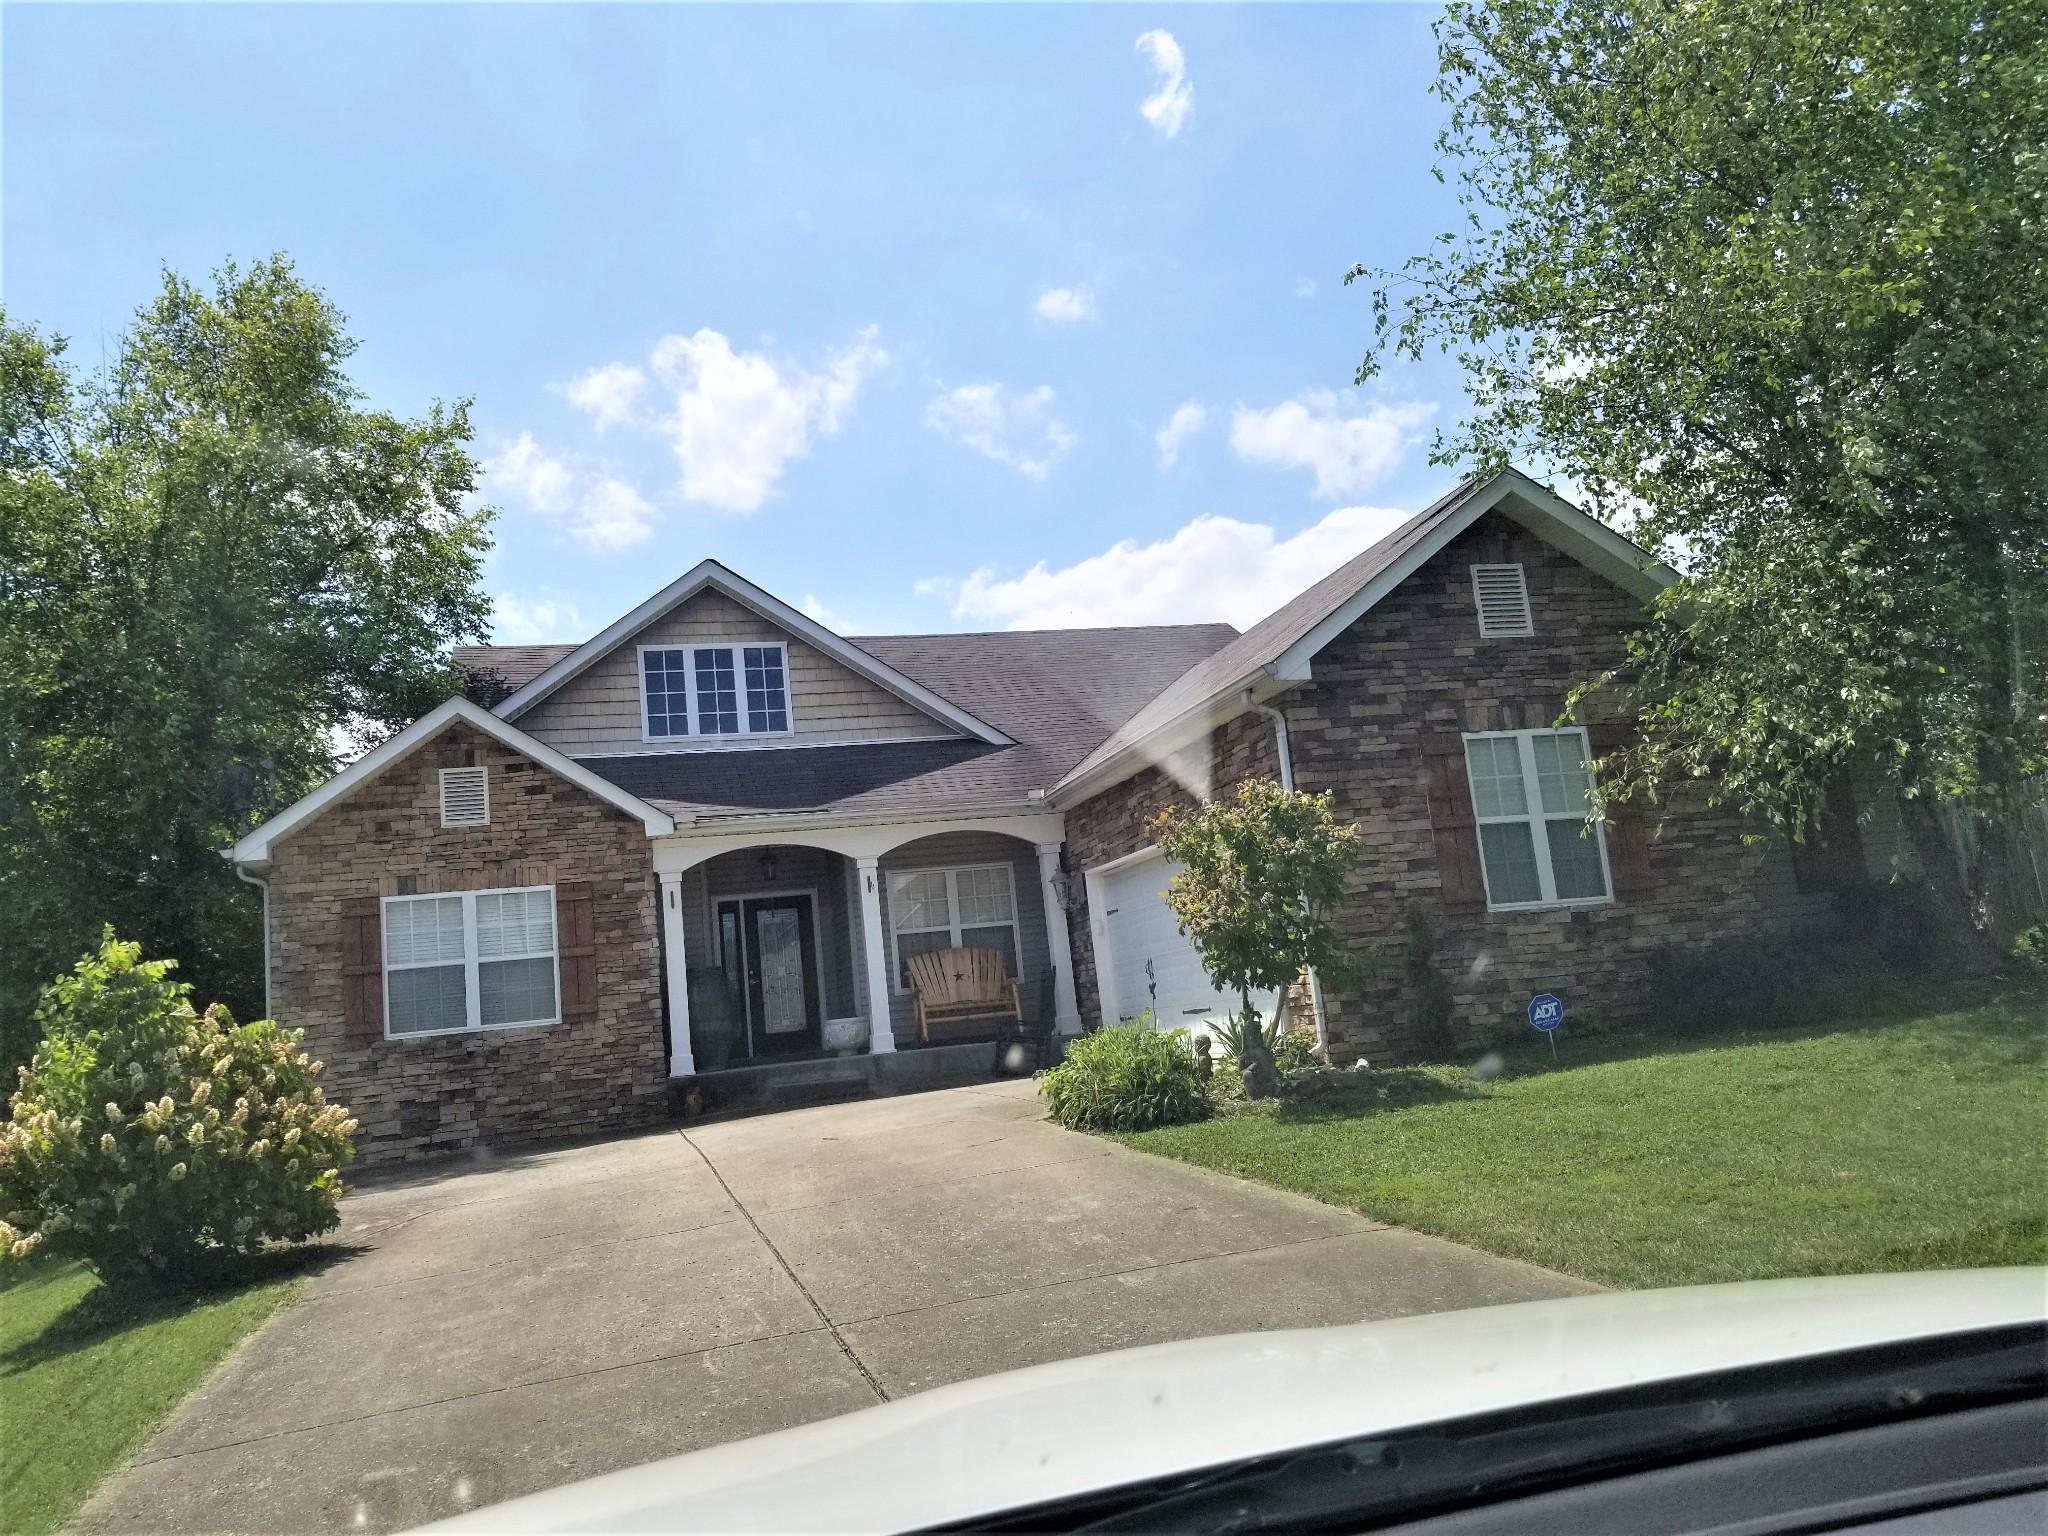 1344 Nicole Ln, LA VERGNE, TN 37086 - LA VERGNE, TN real estate listing